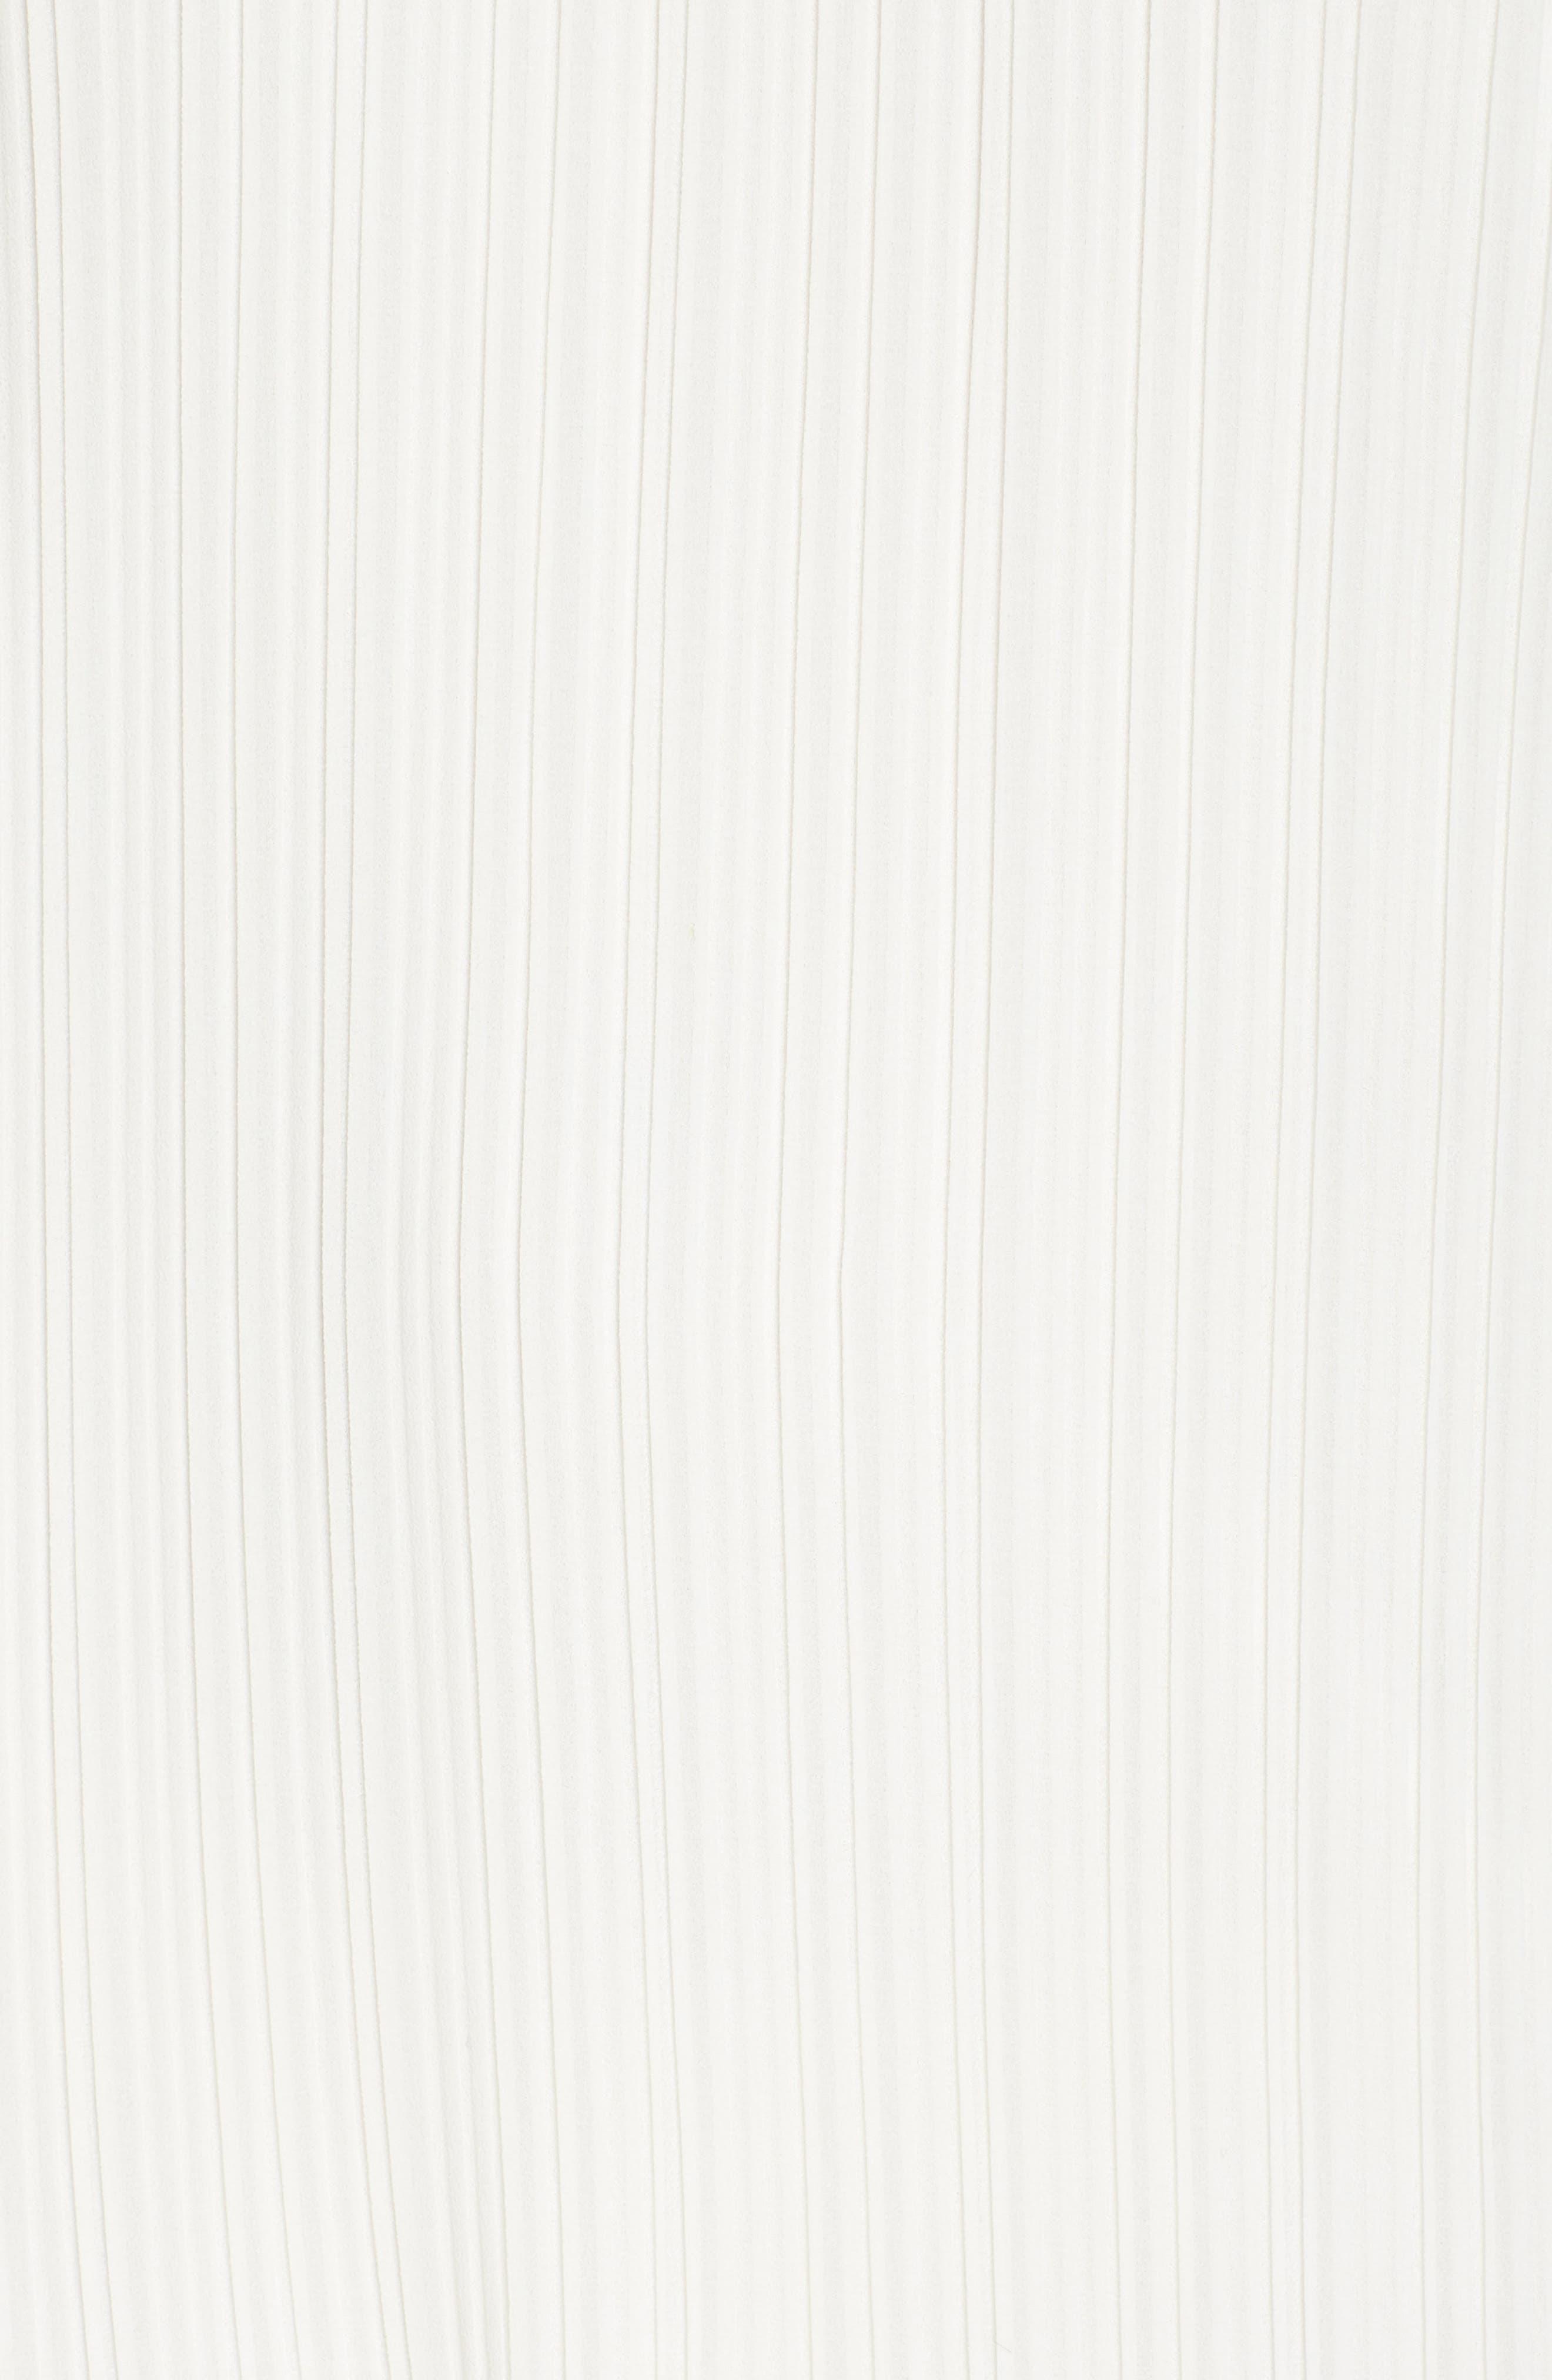 ALI & JAY, Waterlily Pleated Minidress, Alternate thumbnail 6, color, WHITE